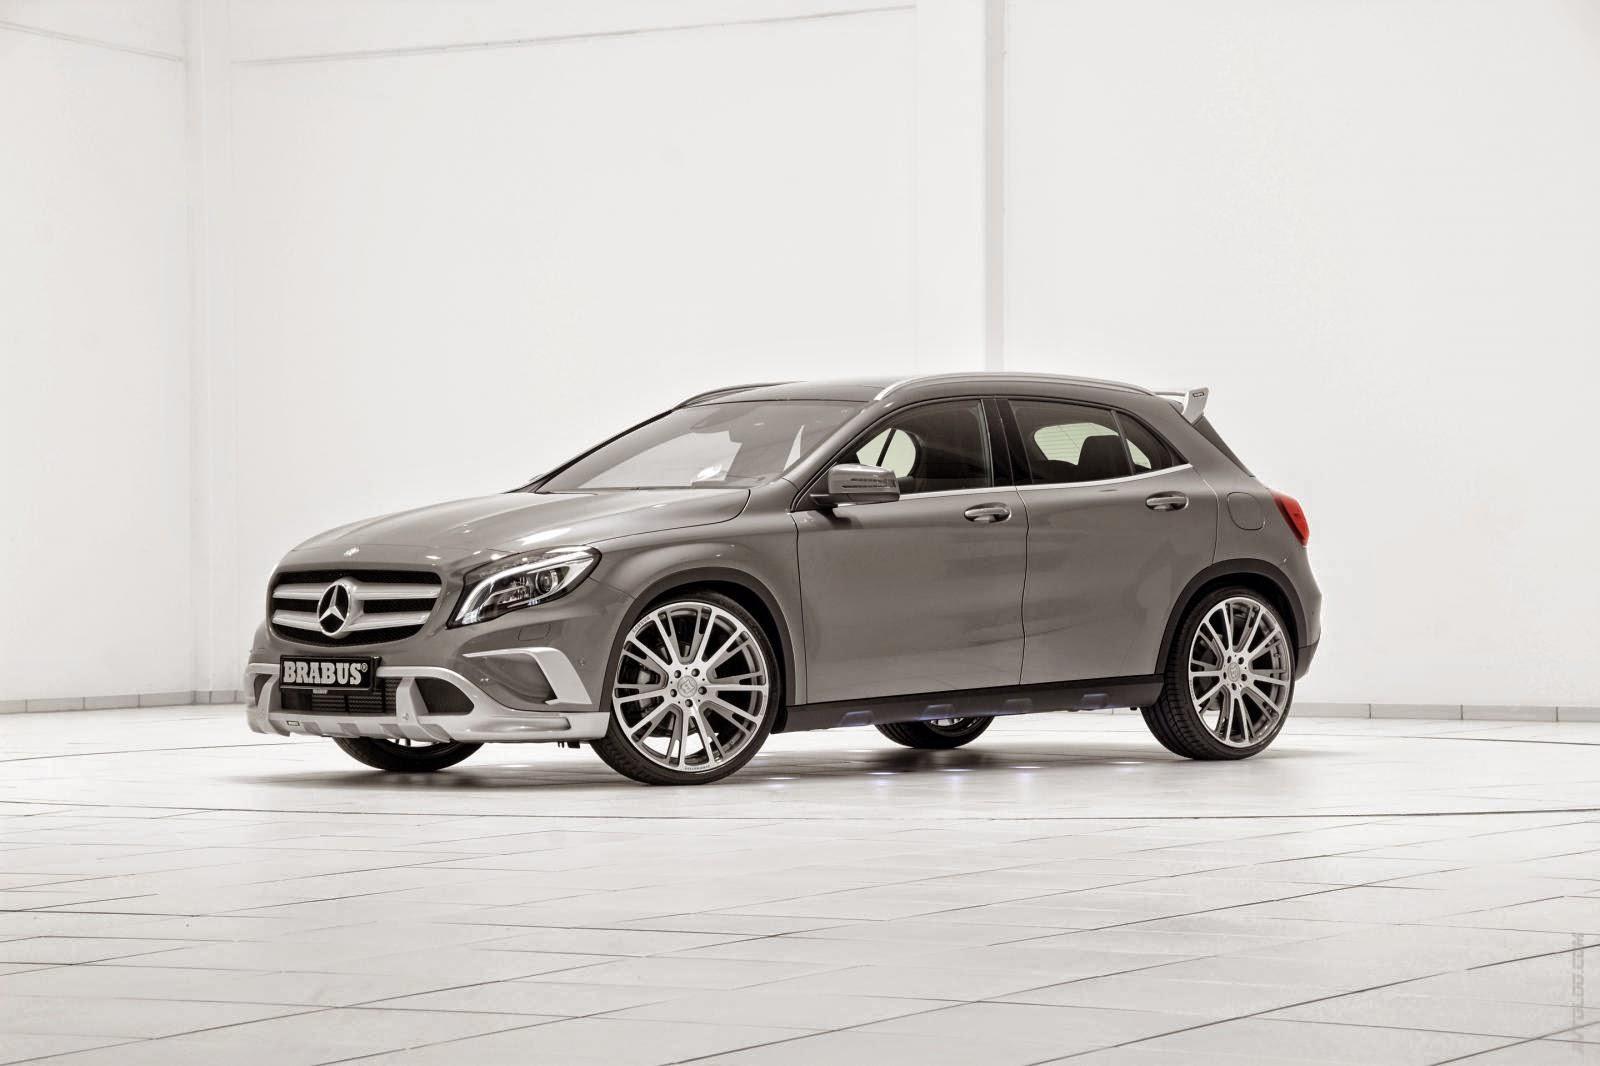 Mercedes benz x156 gla220 cdi by brabus benztuning for 2014 mercedes benz gla class